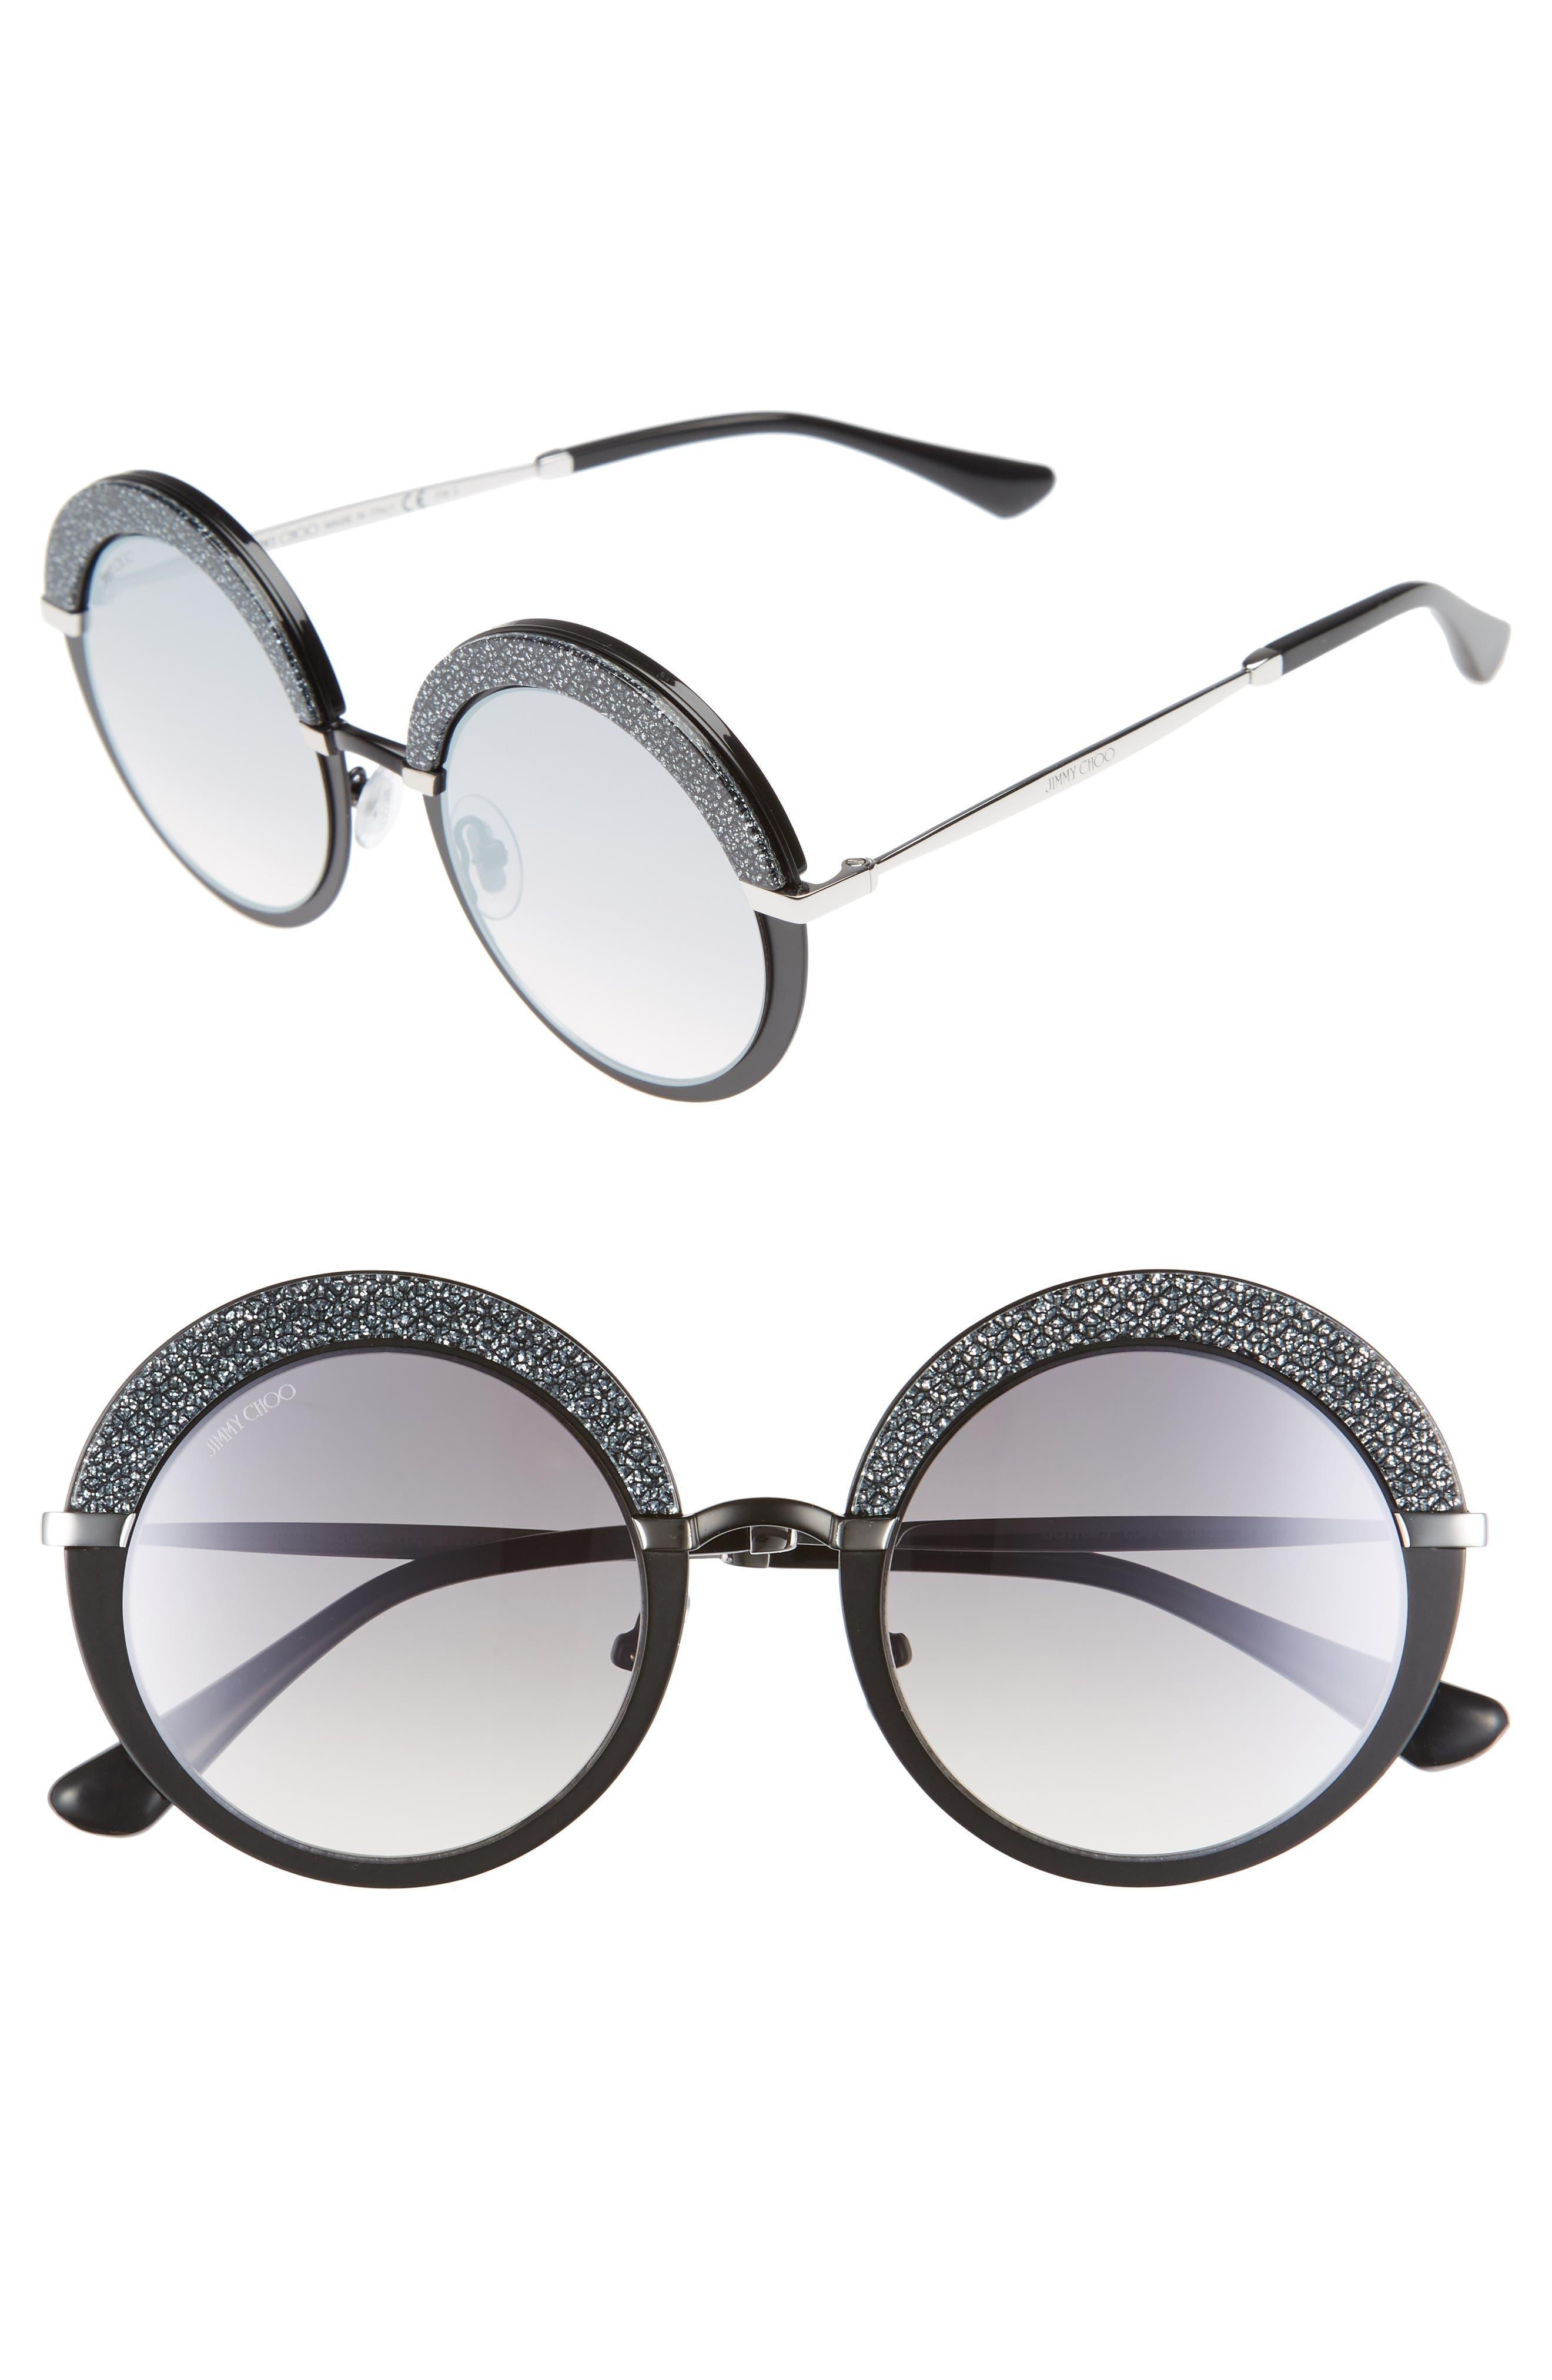 Alternate Image 1 Selected - Jimmy Choo Gotha/S 50mm Round Sunglasses